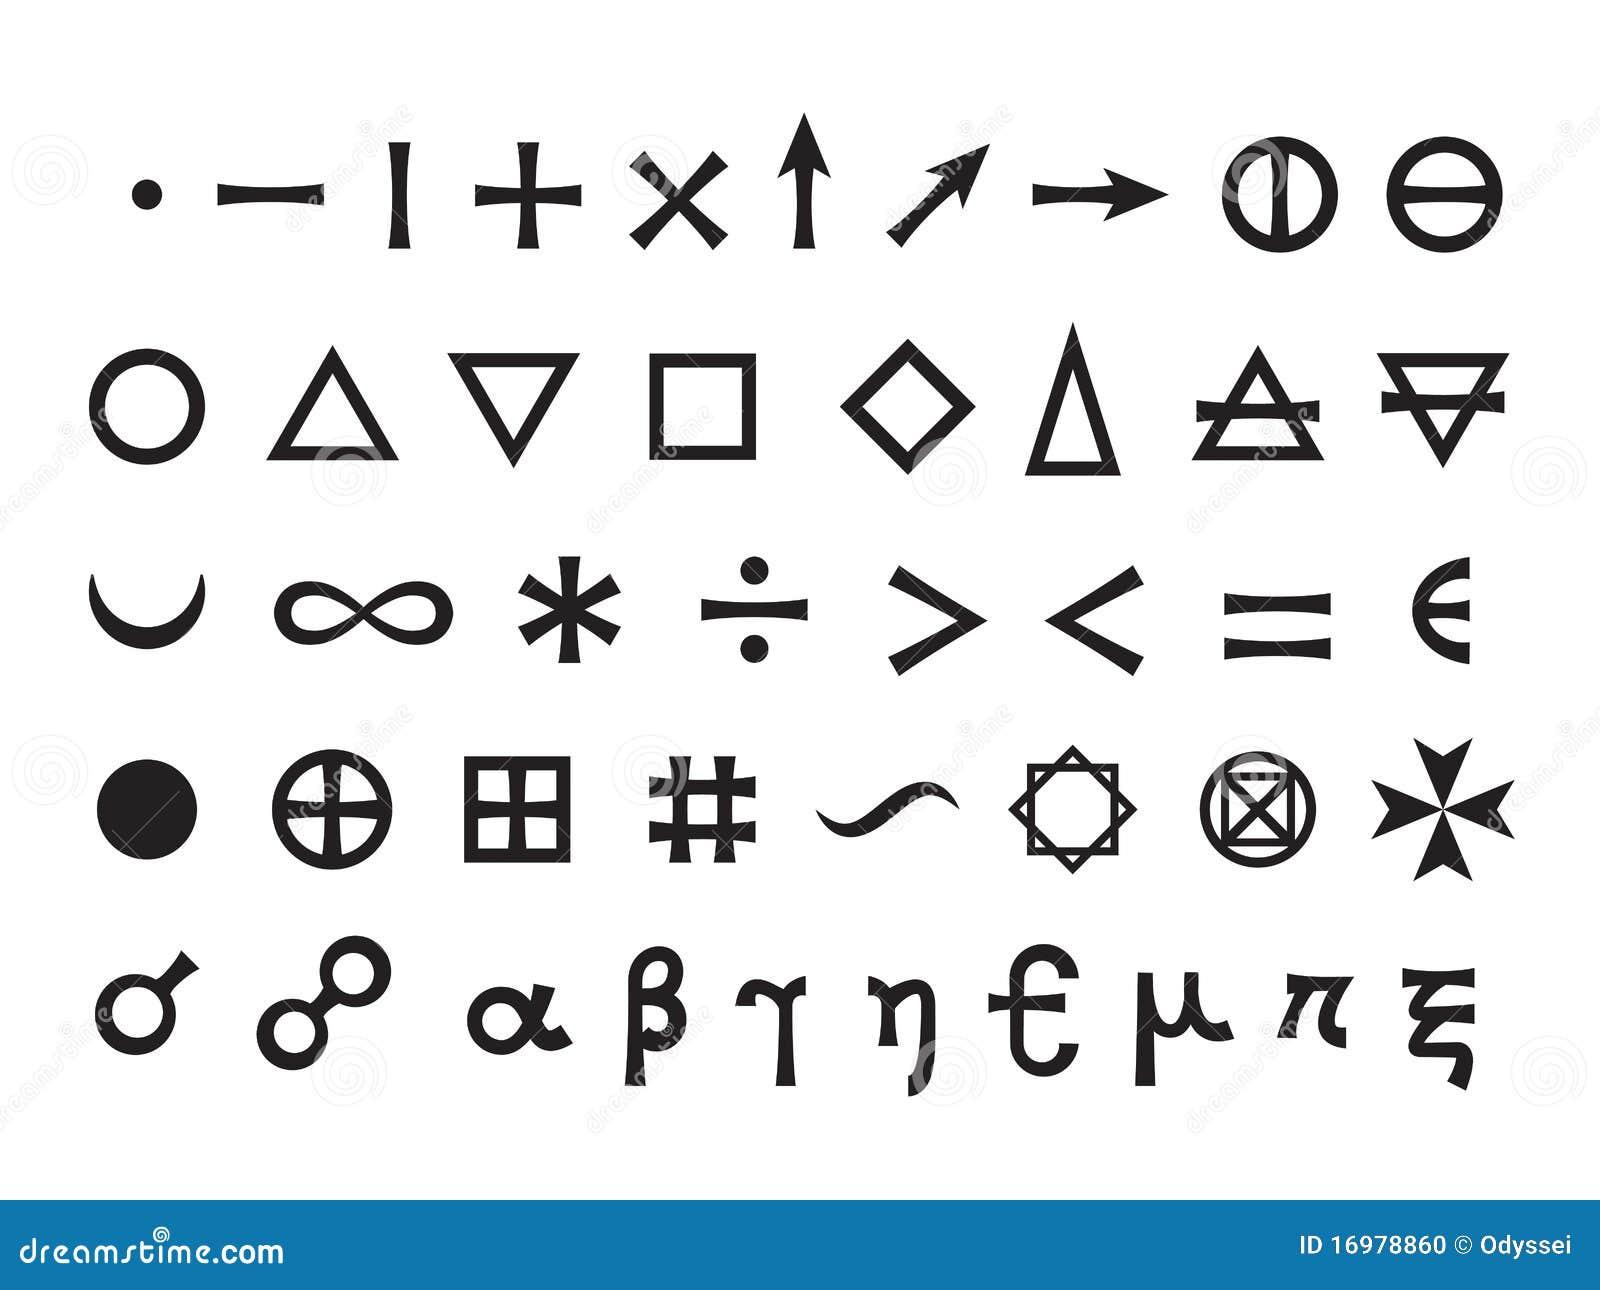 Basic elements and mathematical symbols stock vector basic elements and mathematical symbols biocorpaavc Gallery